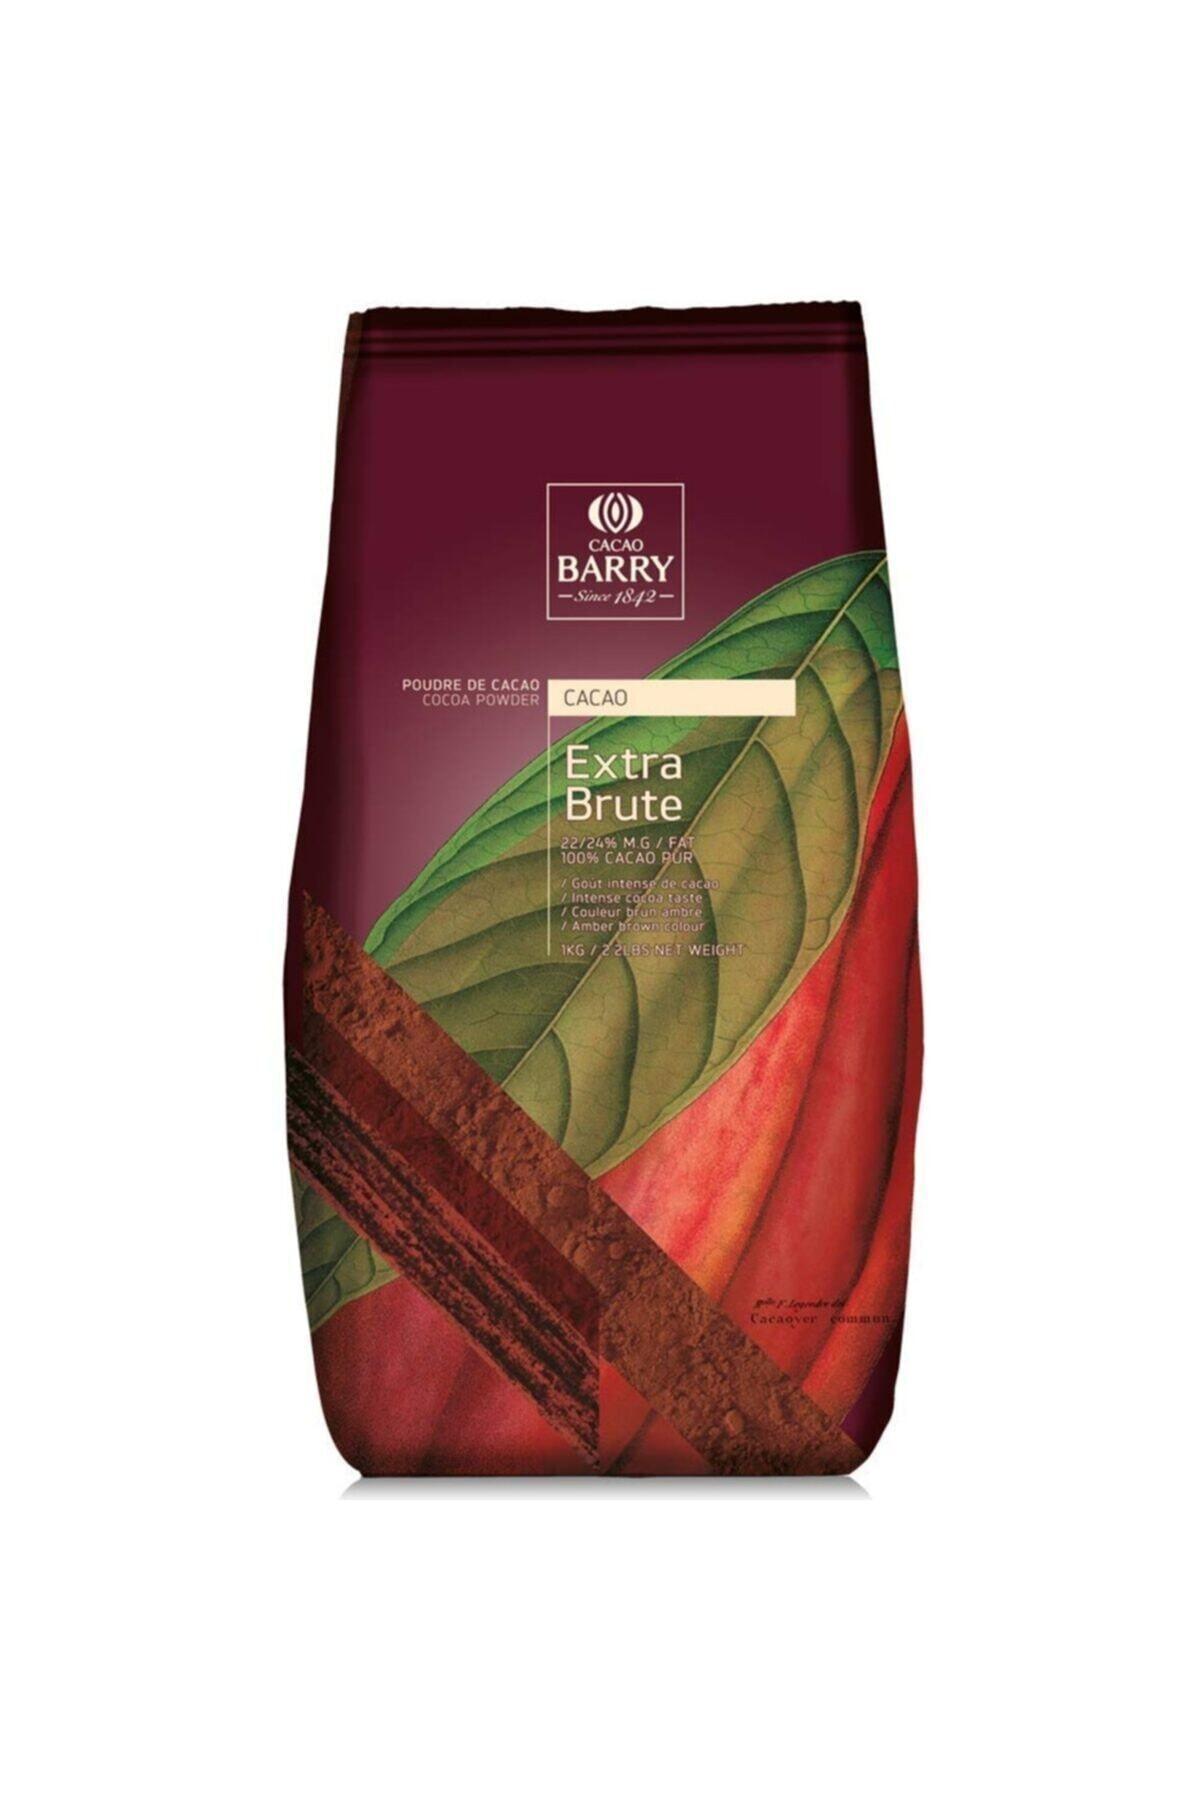 Cacao Barry Extra Brute Kakao Tozu 1 Kg (%22-24 Yağlı)